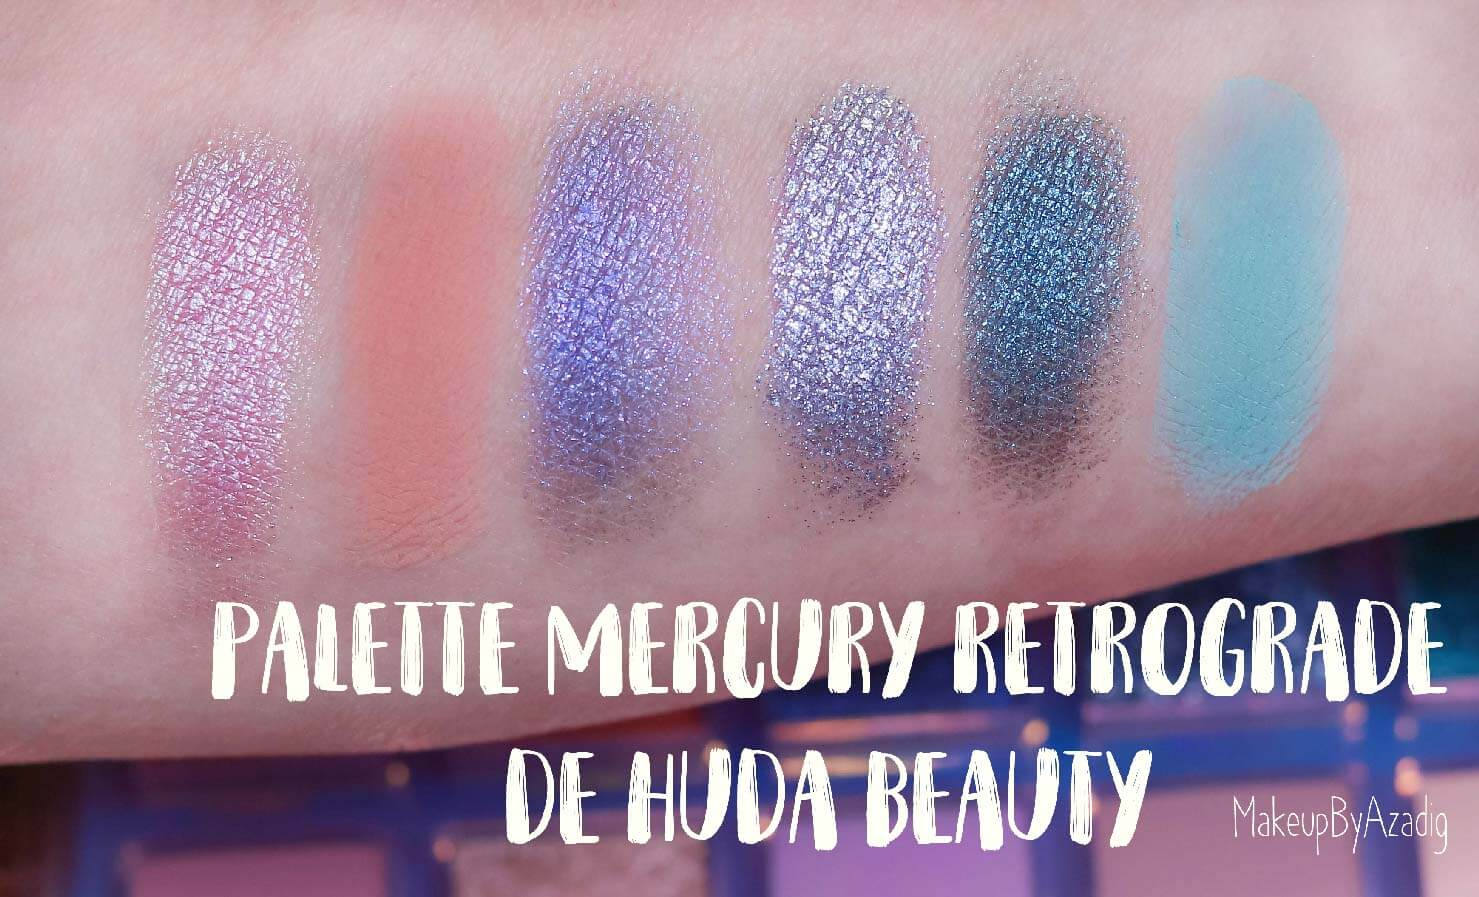 revue-palette-mercury-retrograde-huda-beauty-sephora-france-makeupbyazadig-avis-prix-swatch-astrologie-premiere